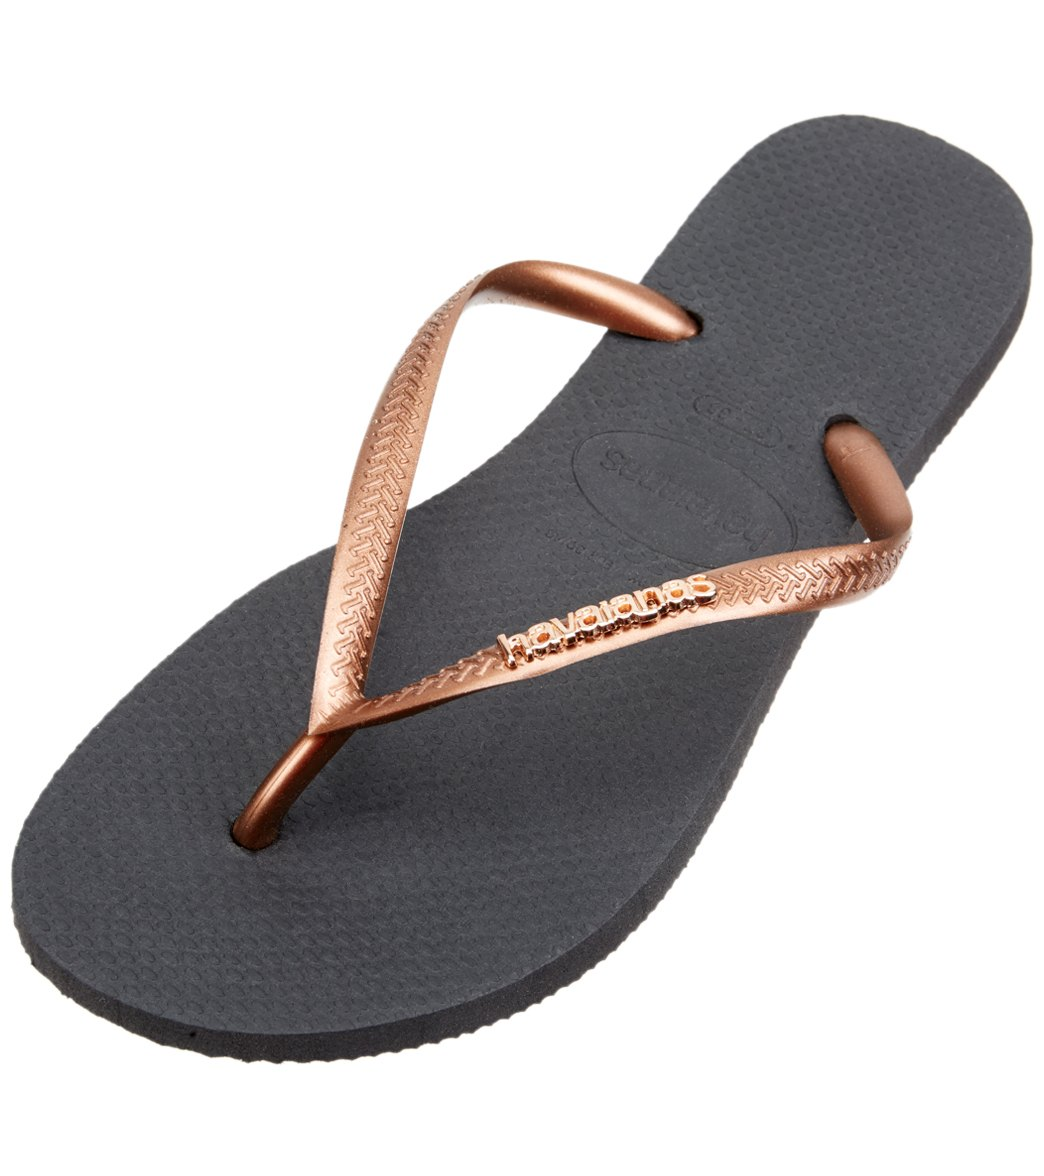 Havaianas Women's Slim Hardware Flip Flops Aubergine/Aubergine Sandal 41/42 Brazil (US Men's 9/10, Women's 11/12) M